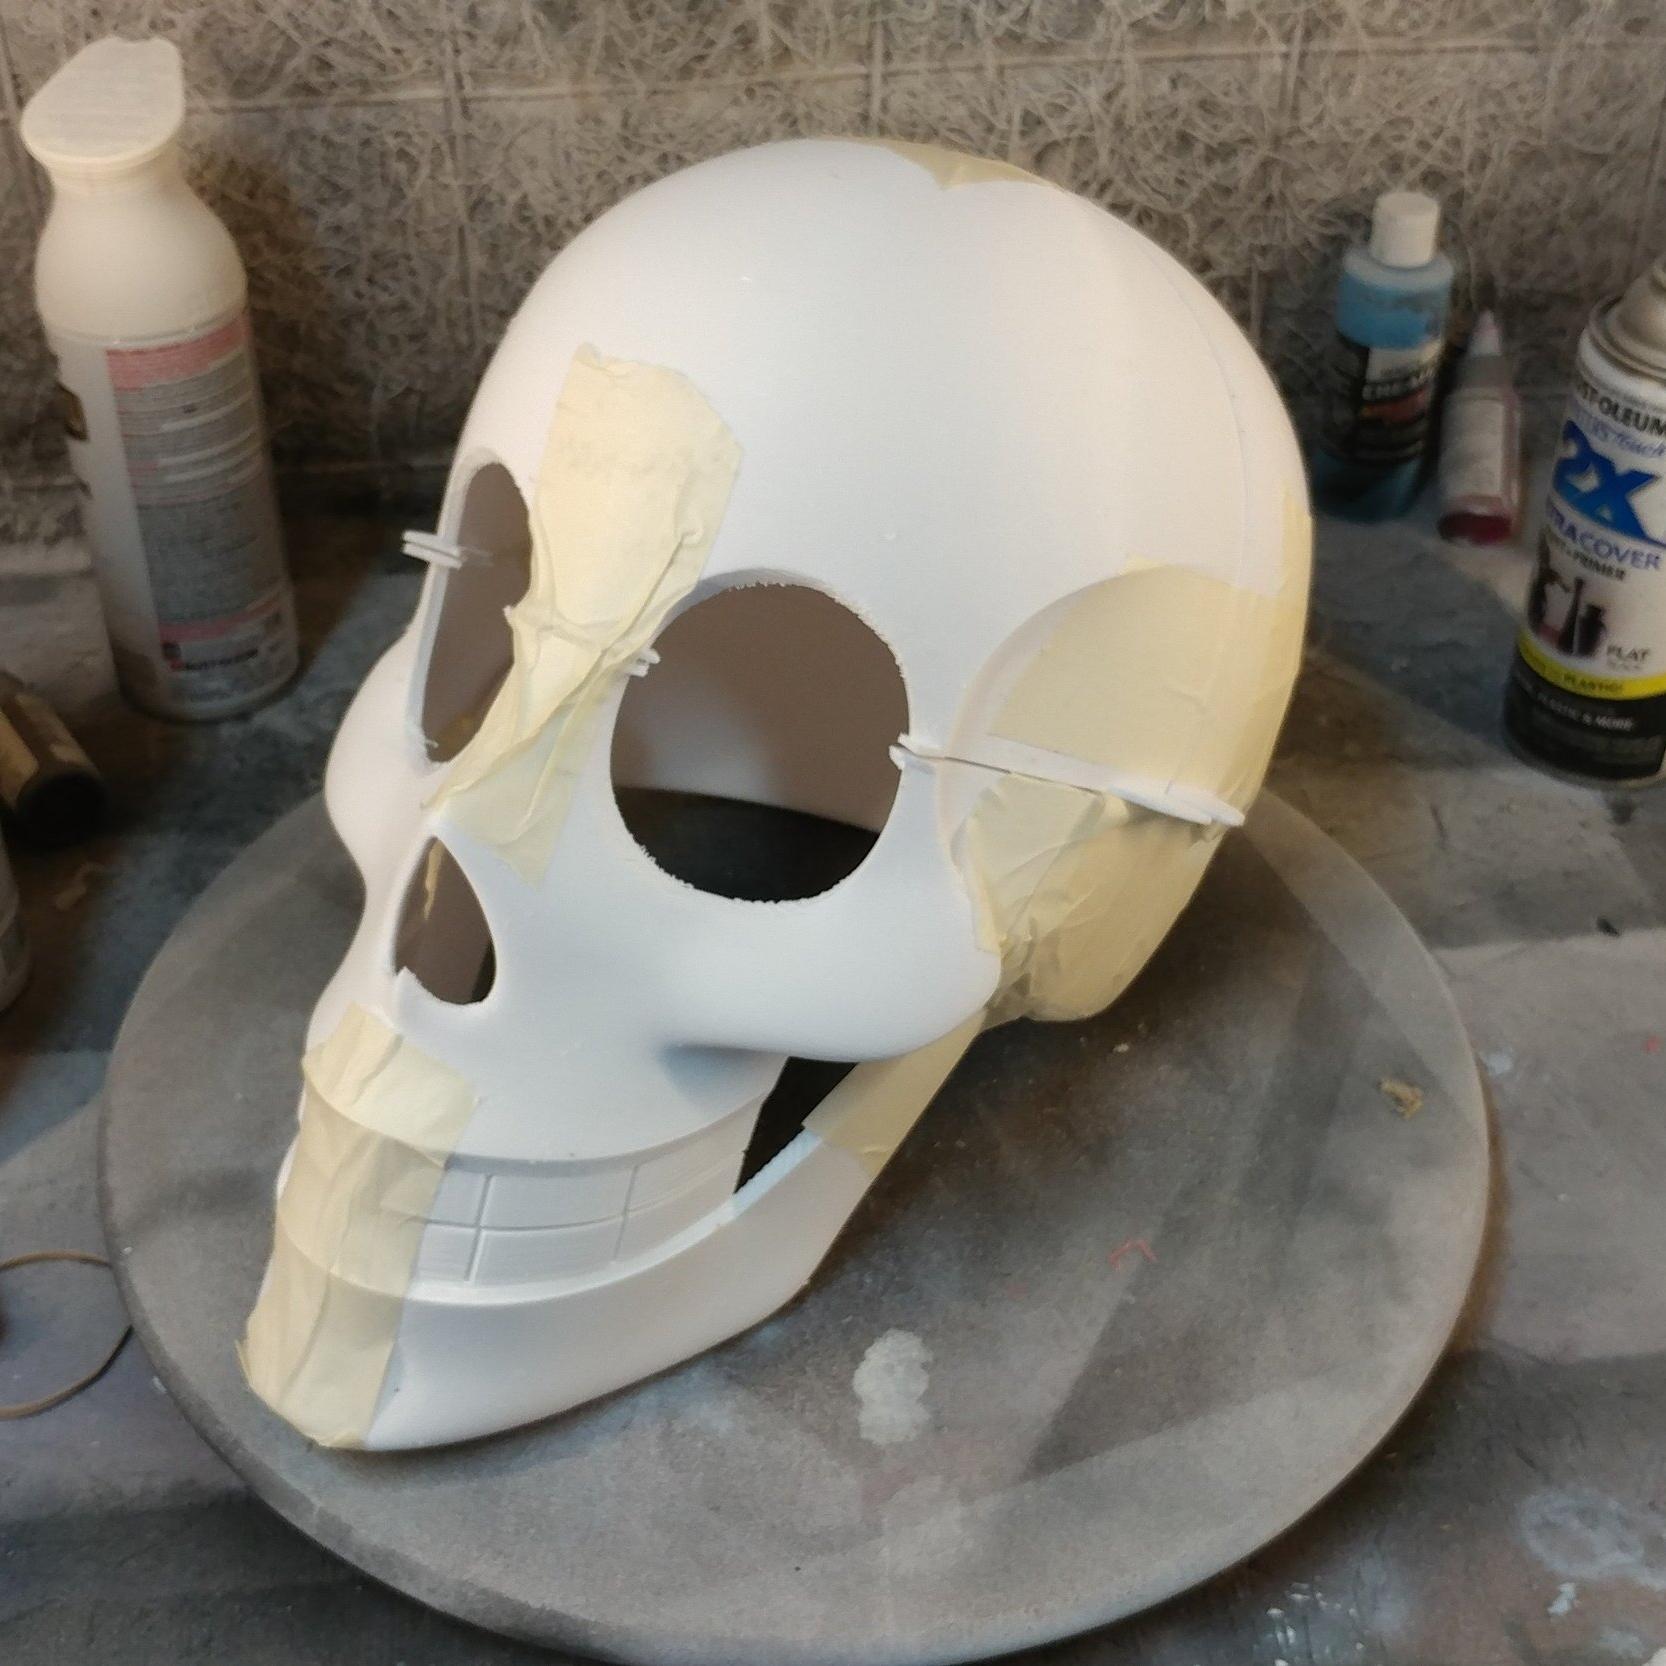 3D PRINTS AND CASTS